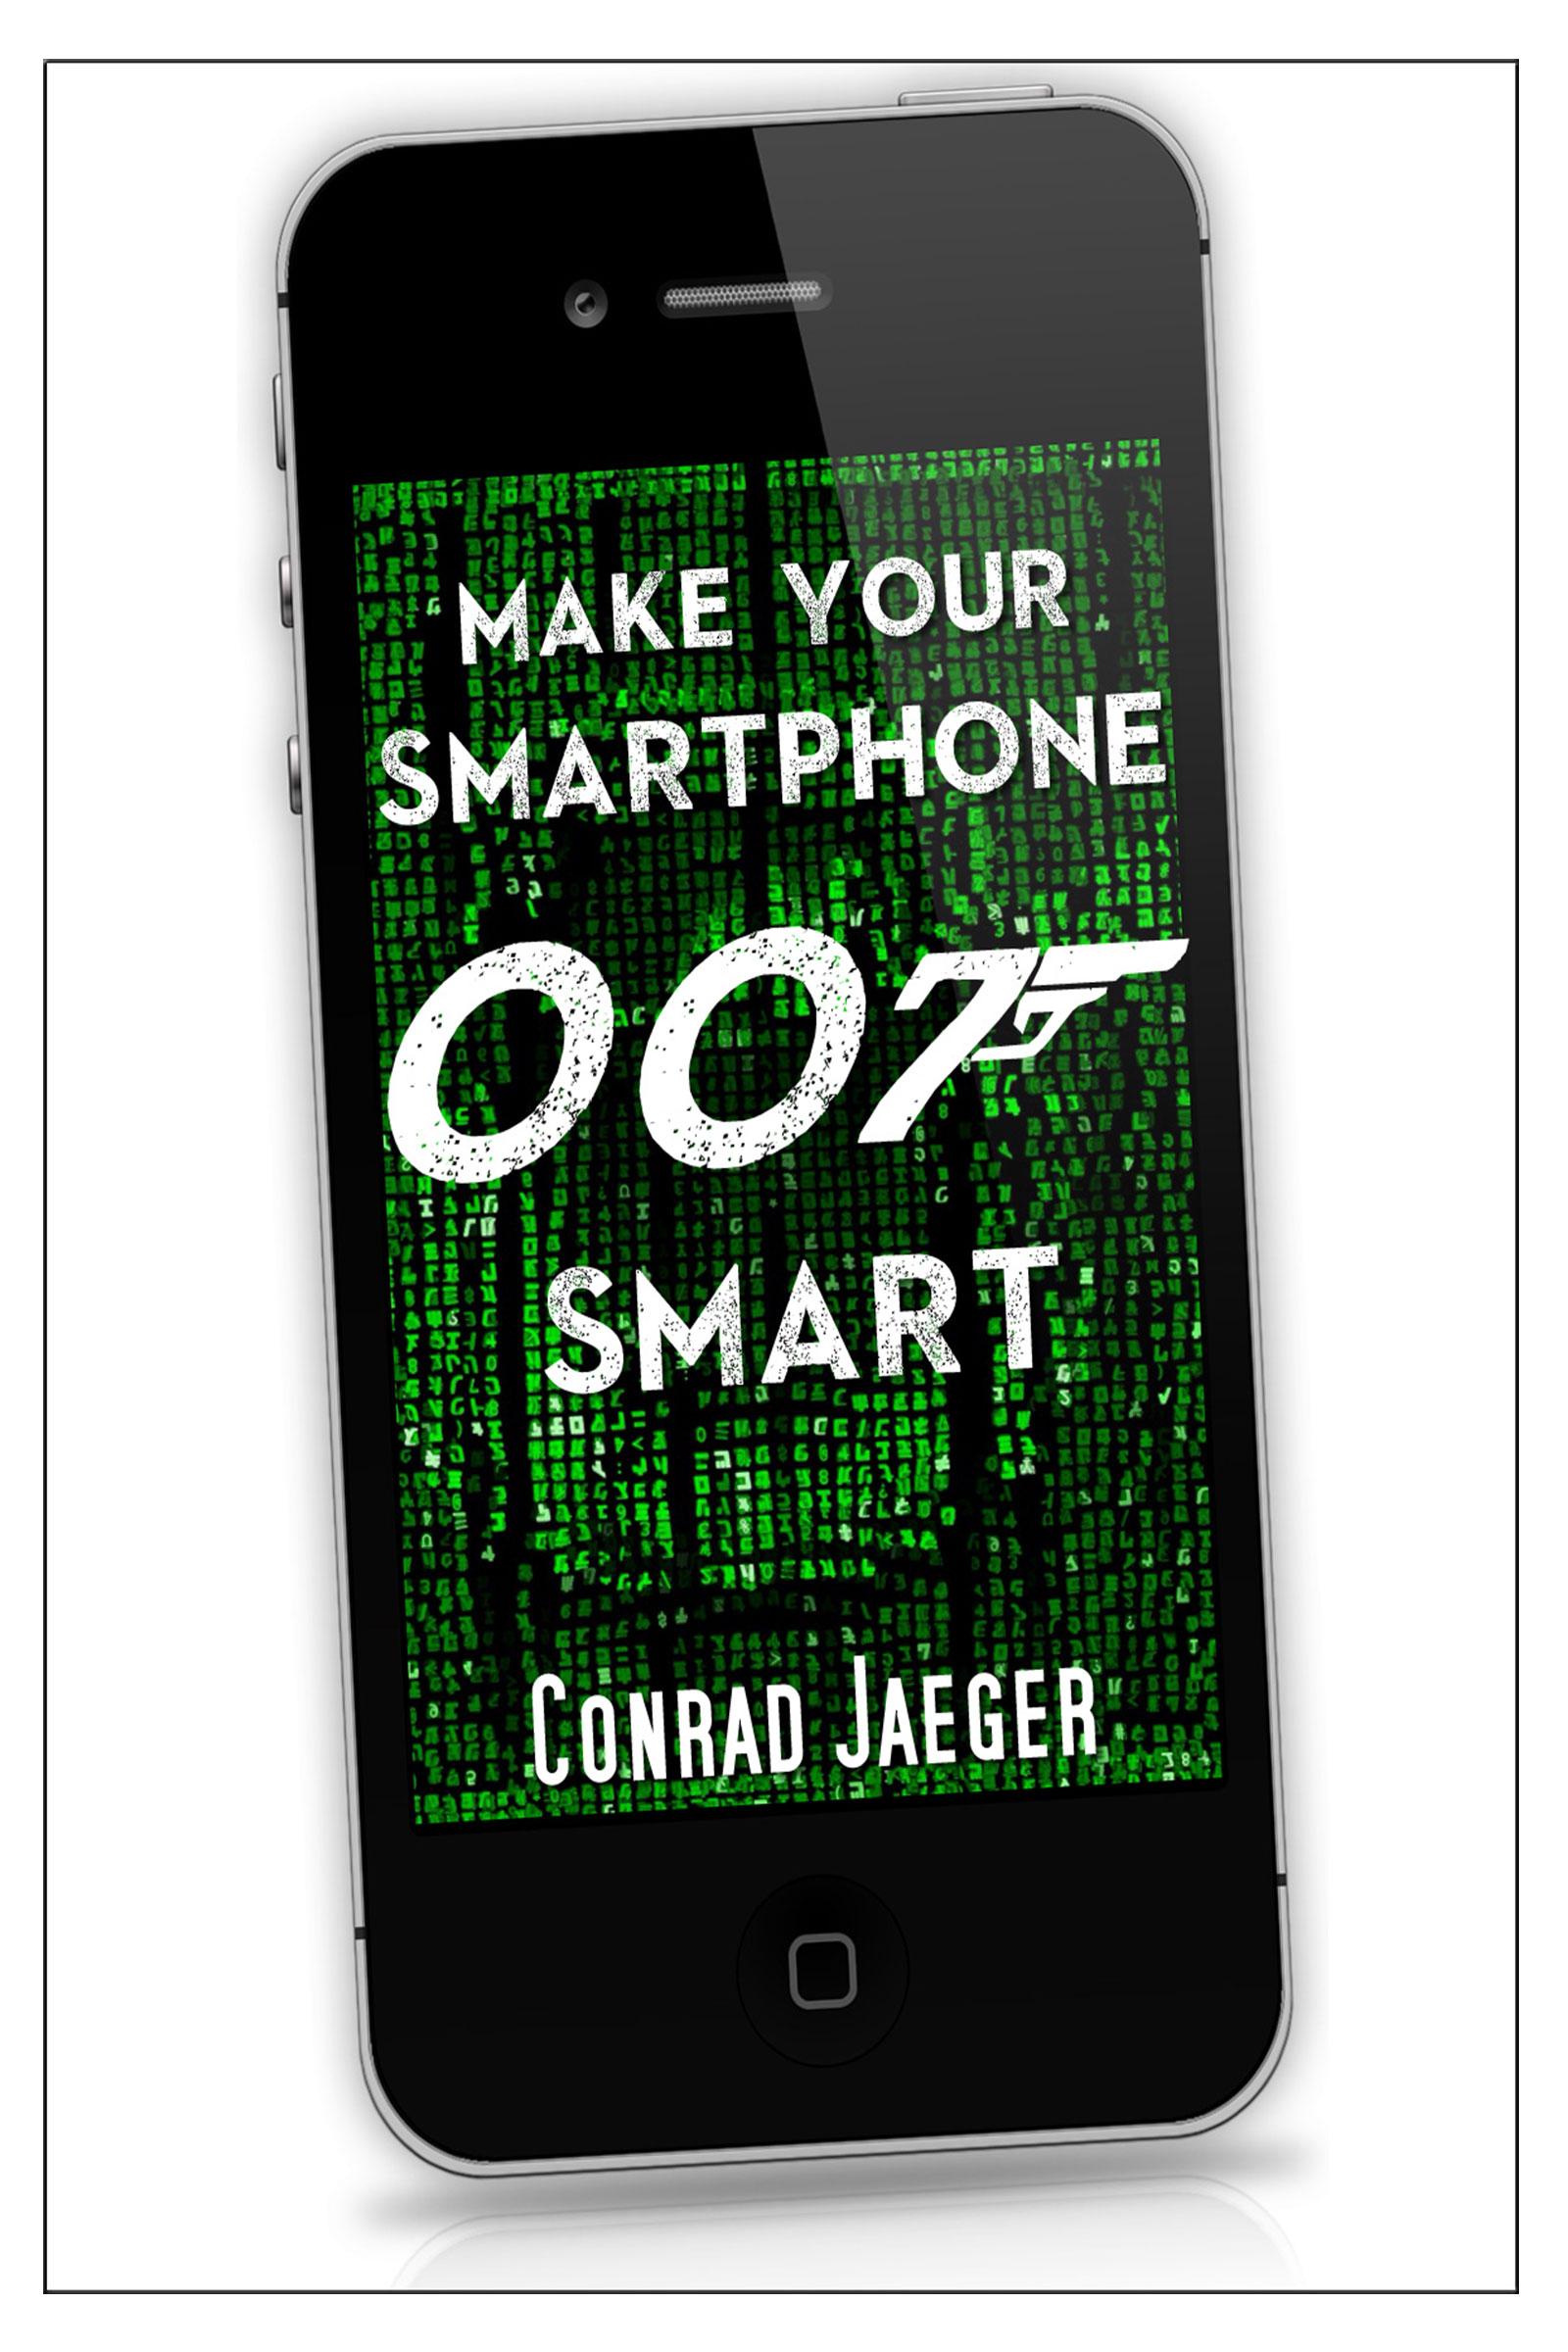 007 keylogger spy software